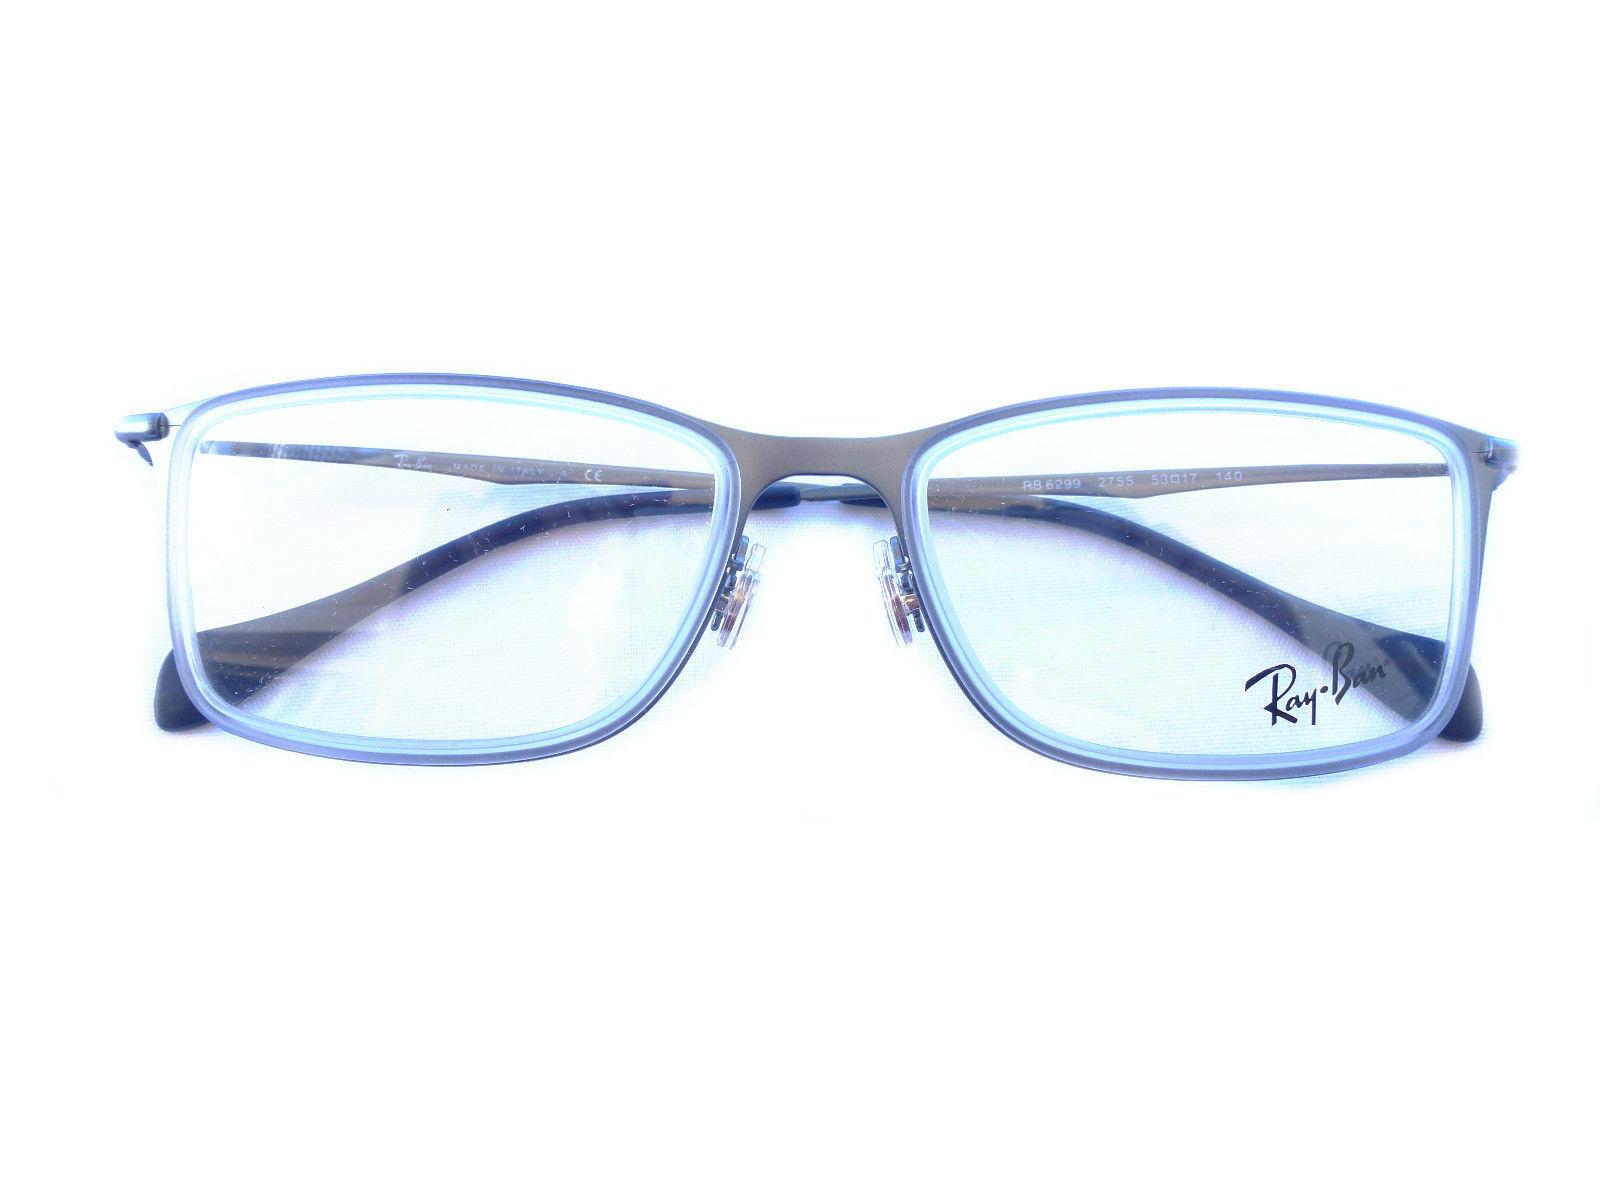 538af1ba7e5 Ray Ban Reading Glasses 1.75 « Heritage Malta